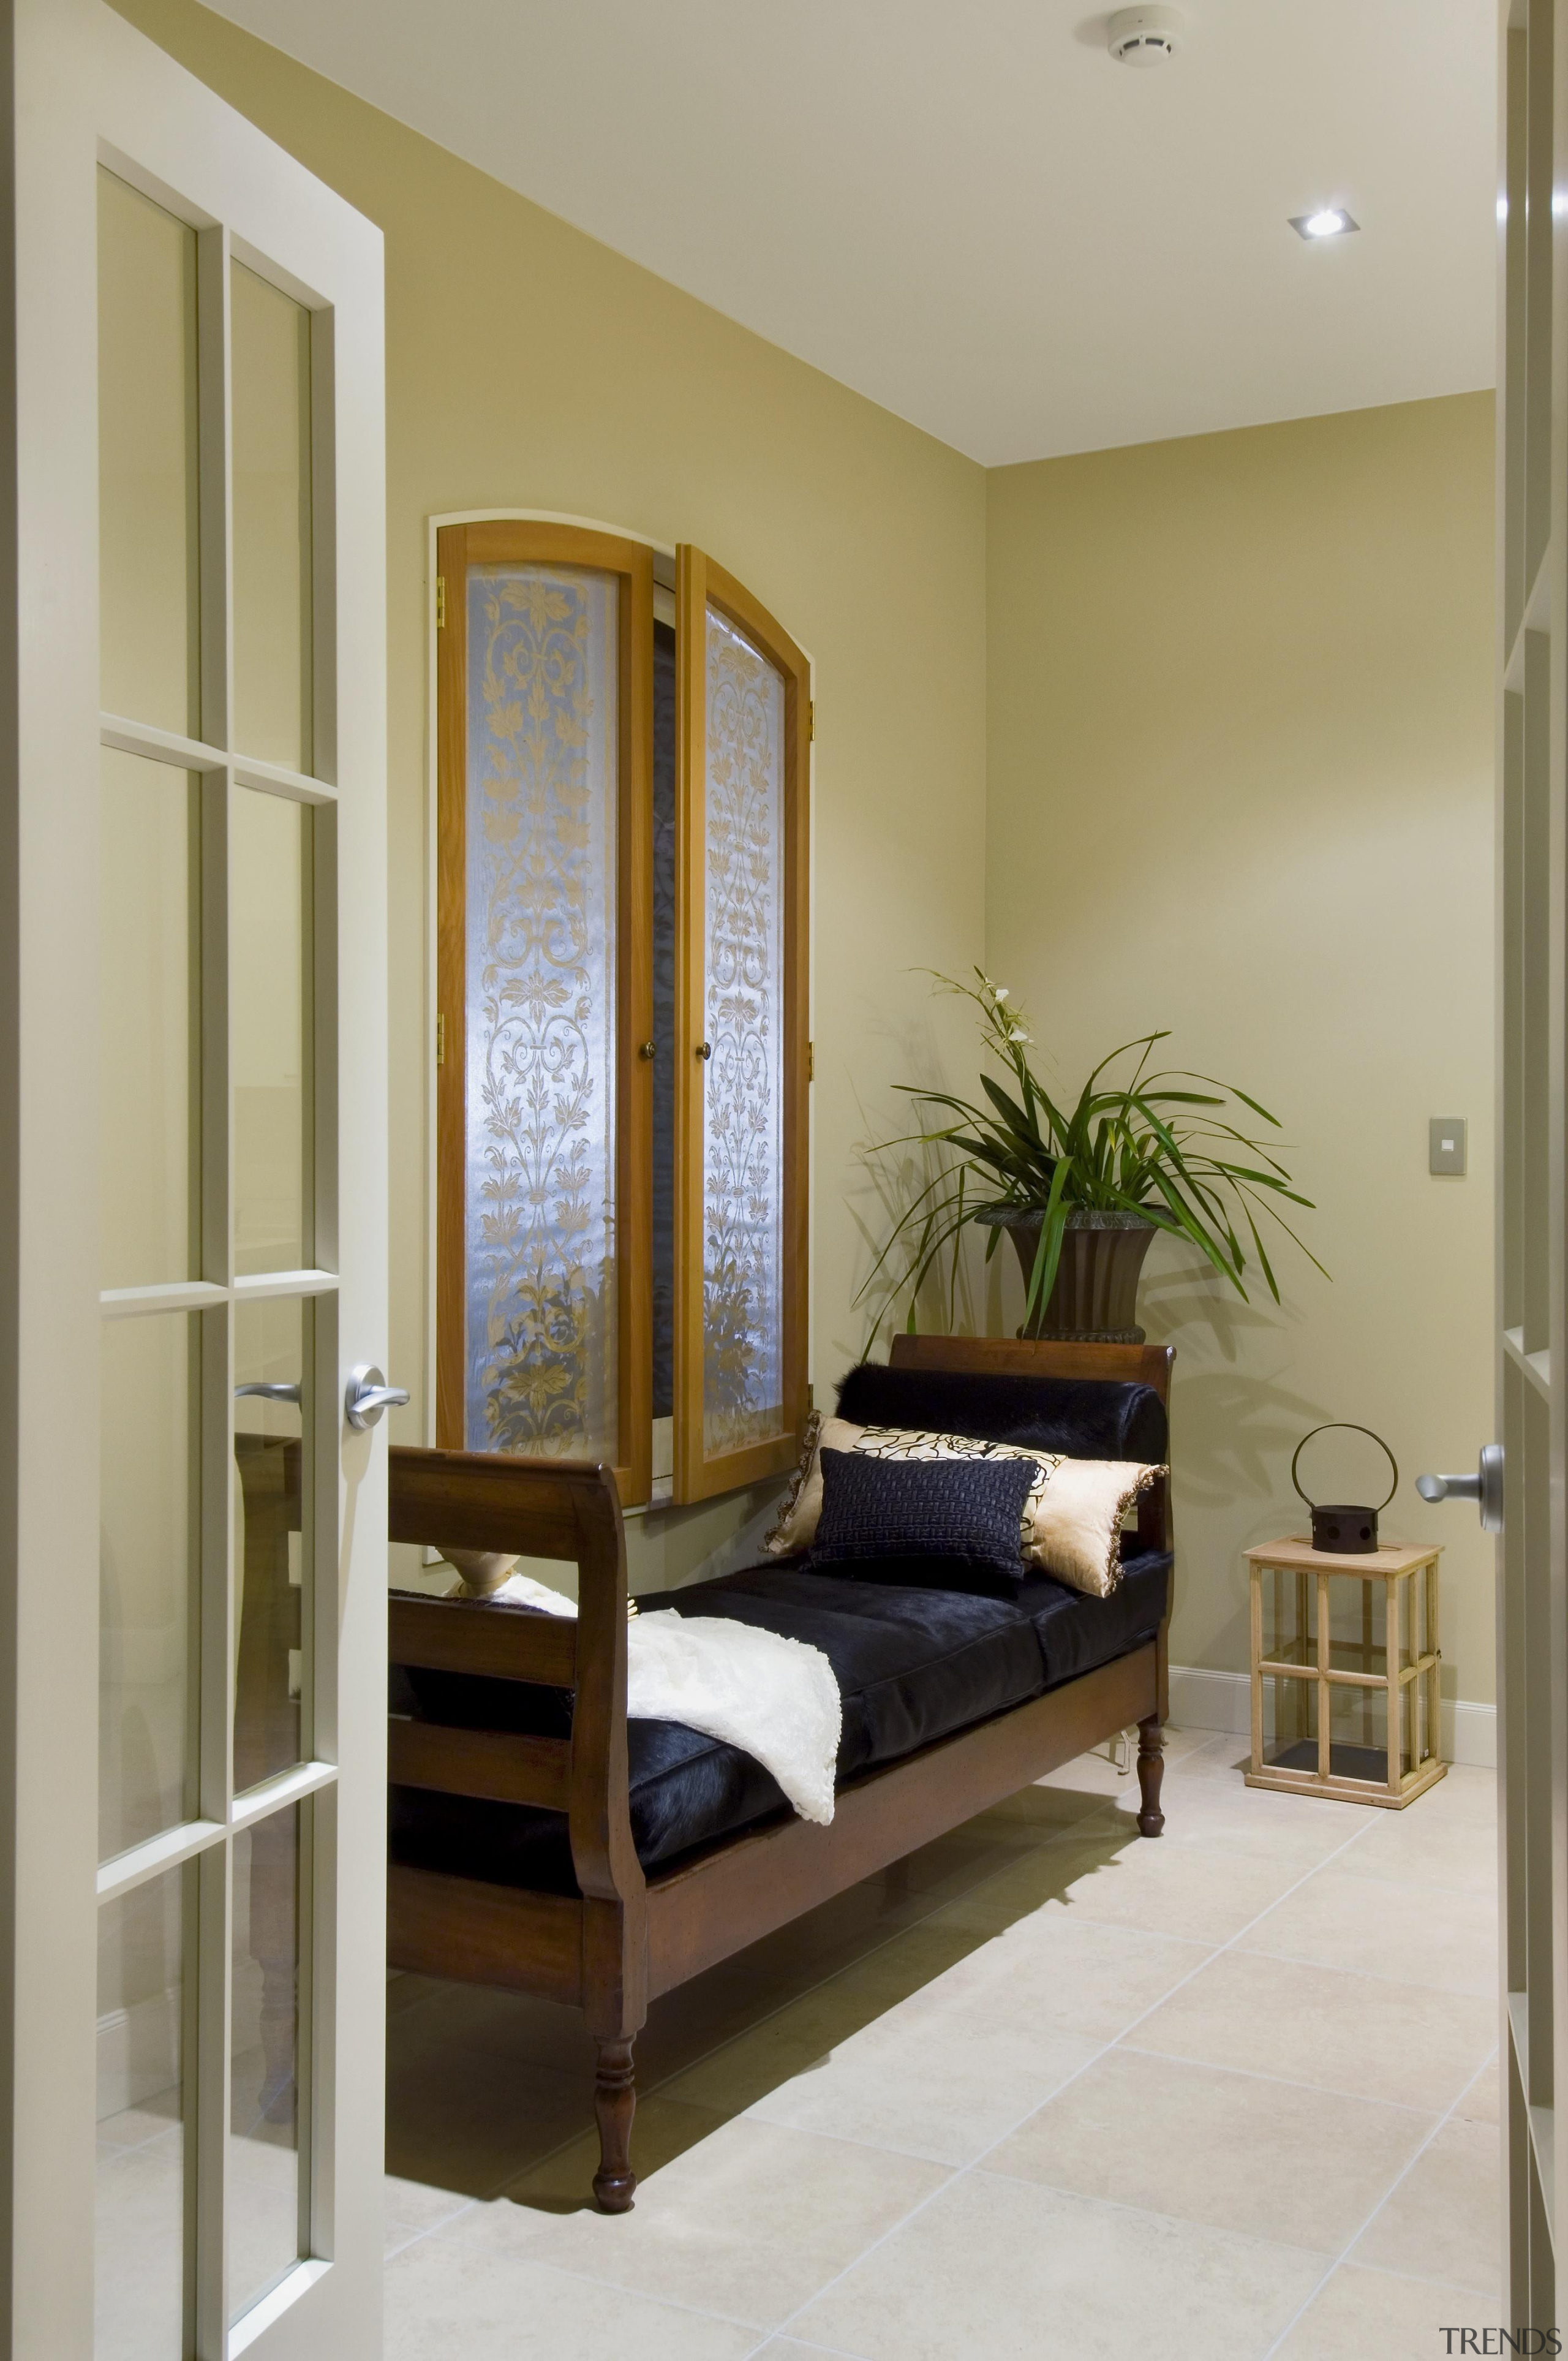 139 mahoenui 9 - Mahoenui 9 - bed bed frame, door, floor, furniture, home, interior design, room, window, gray, brown